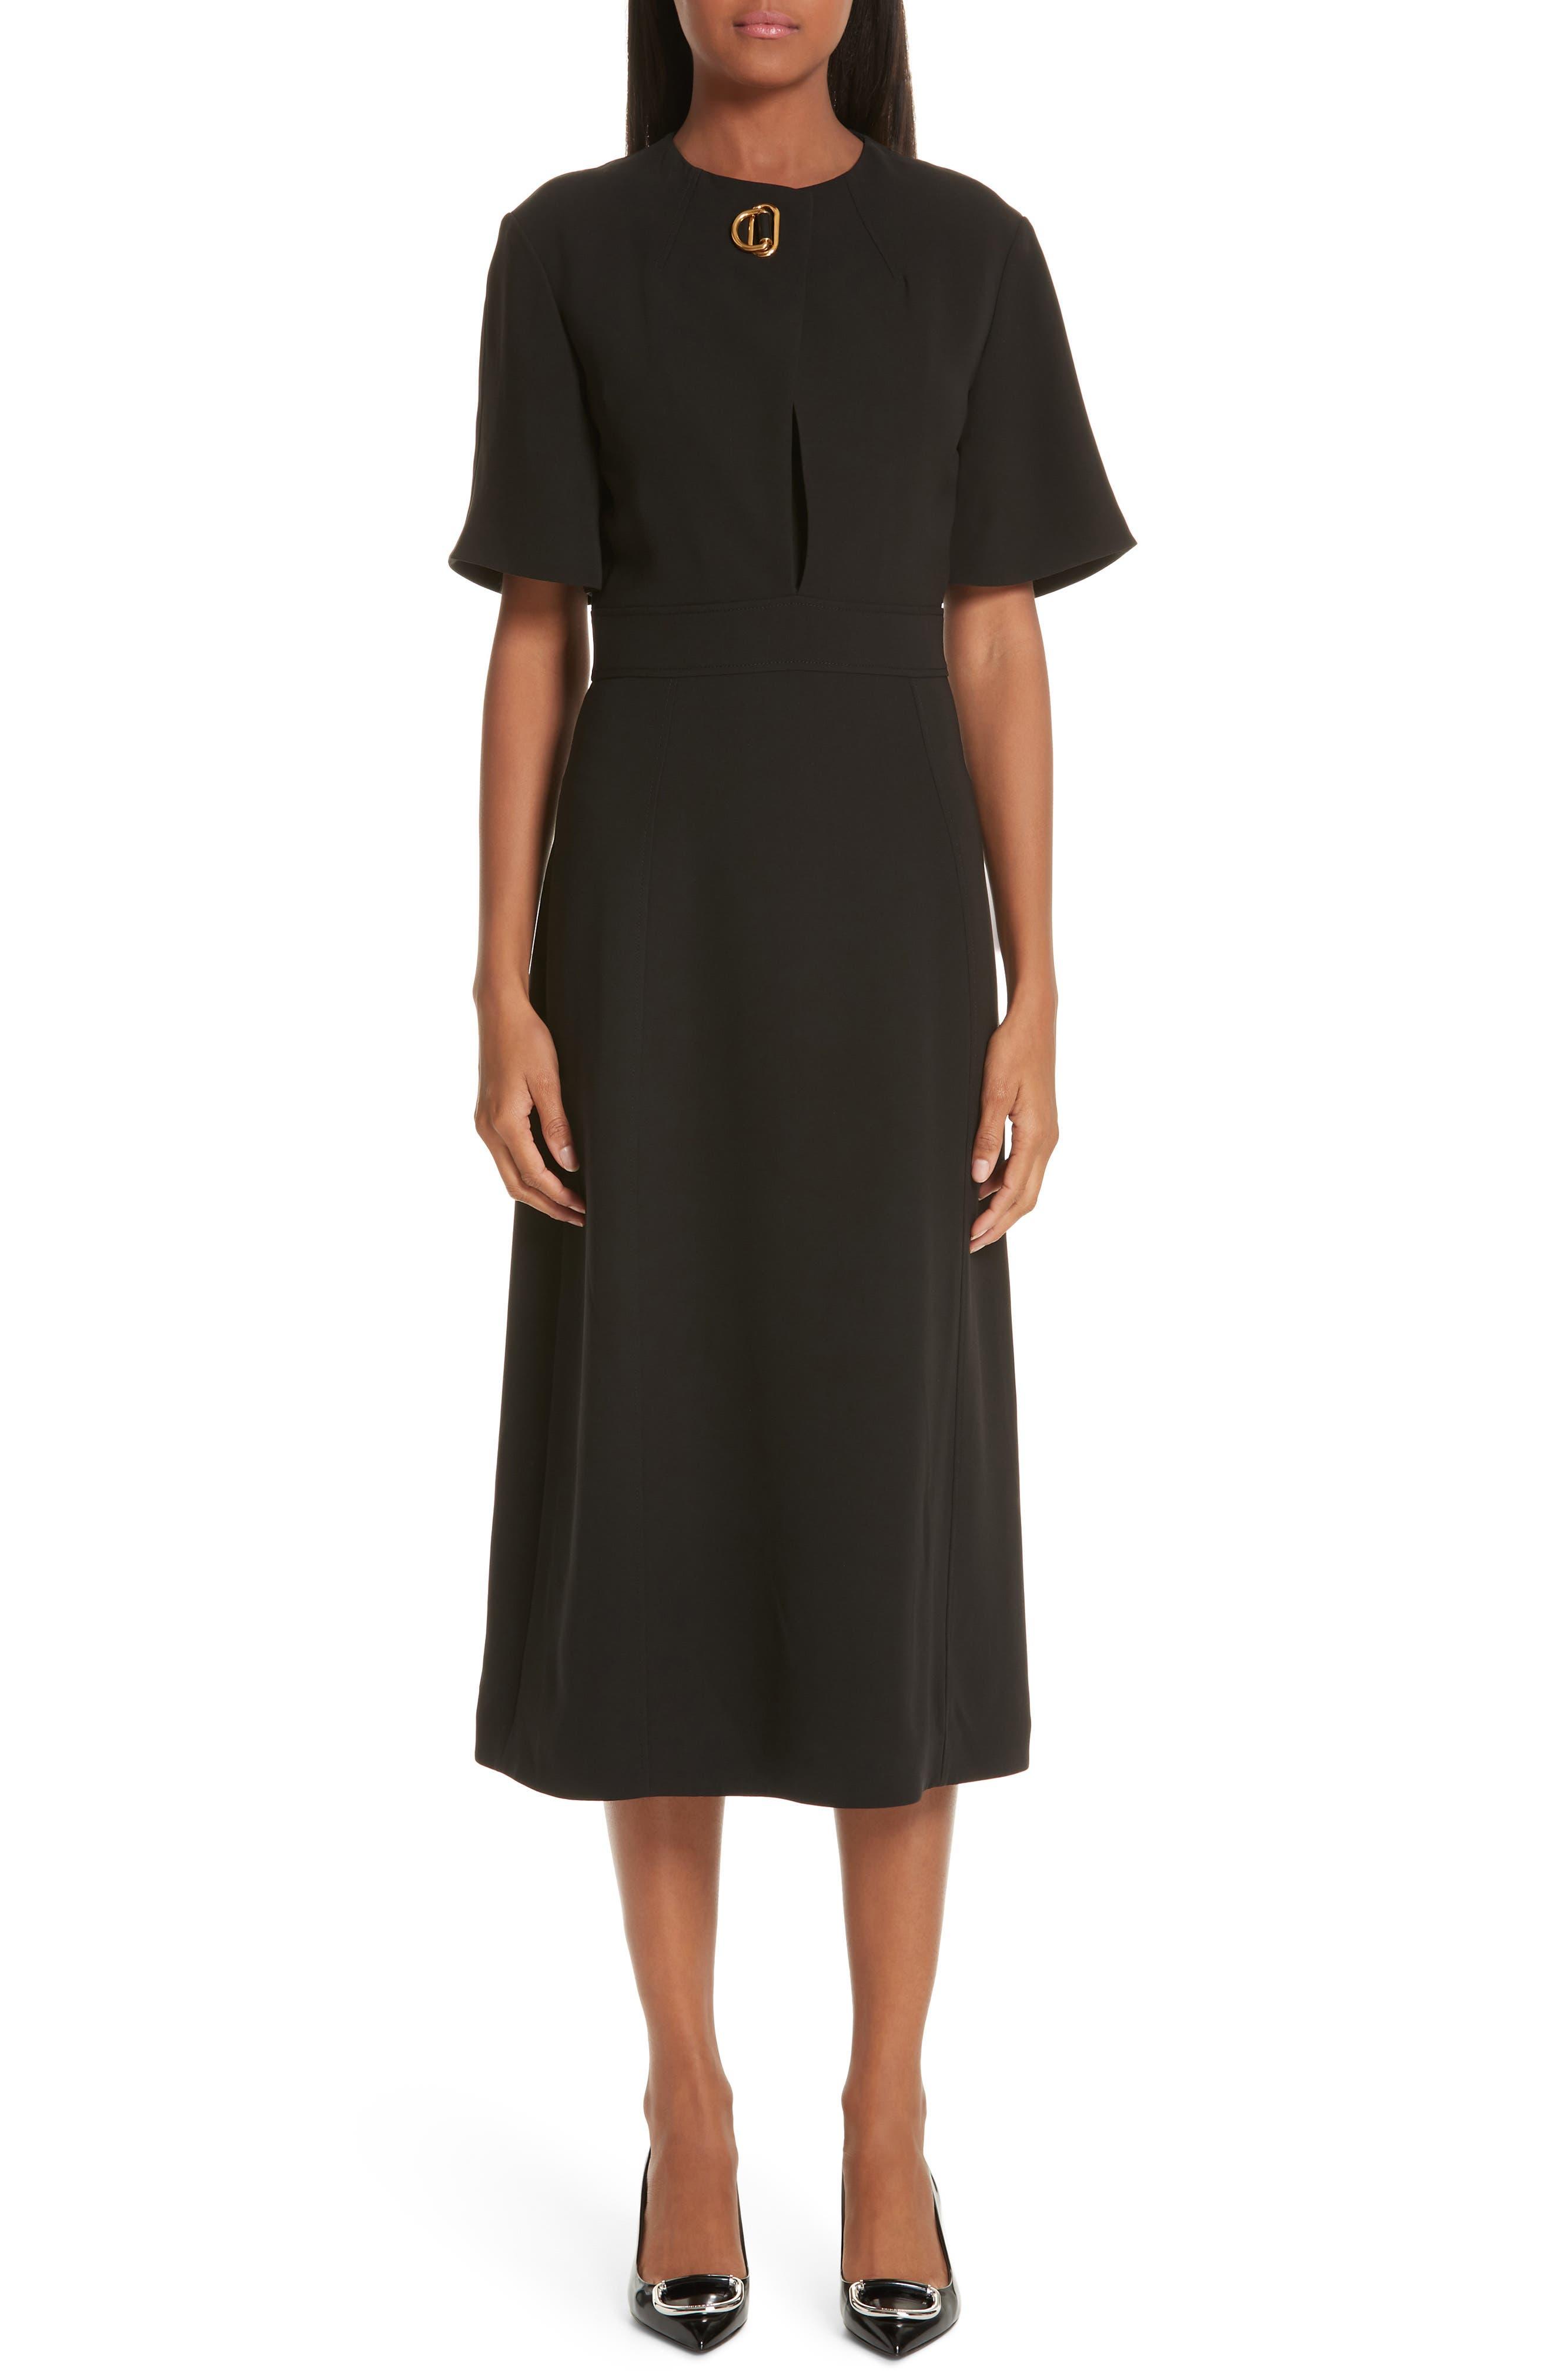 Burberry Kaly D-Ring Detail Silk & Wool Dress, Black